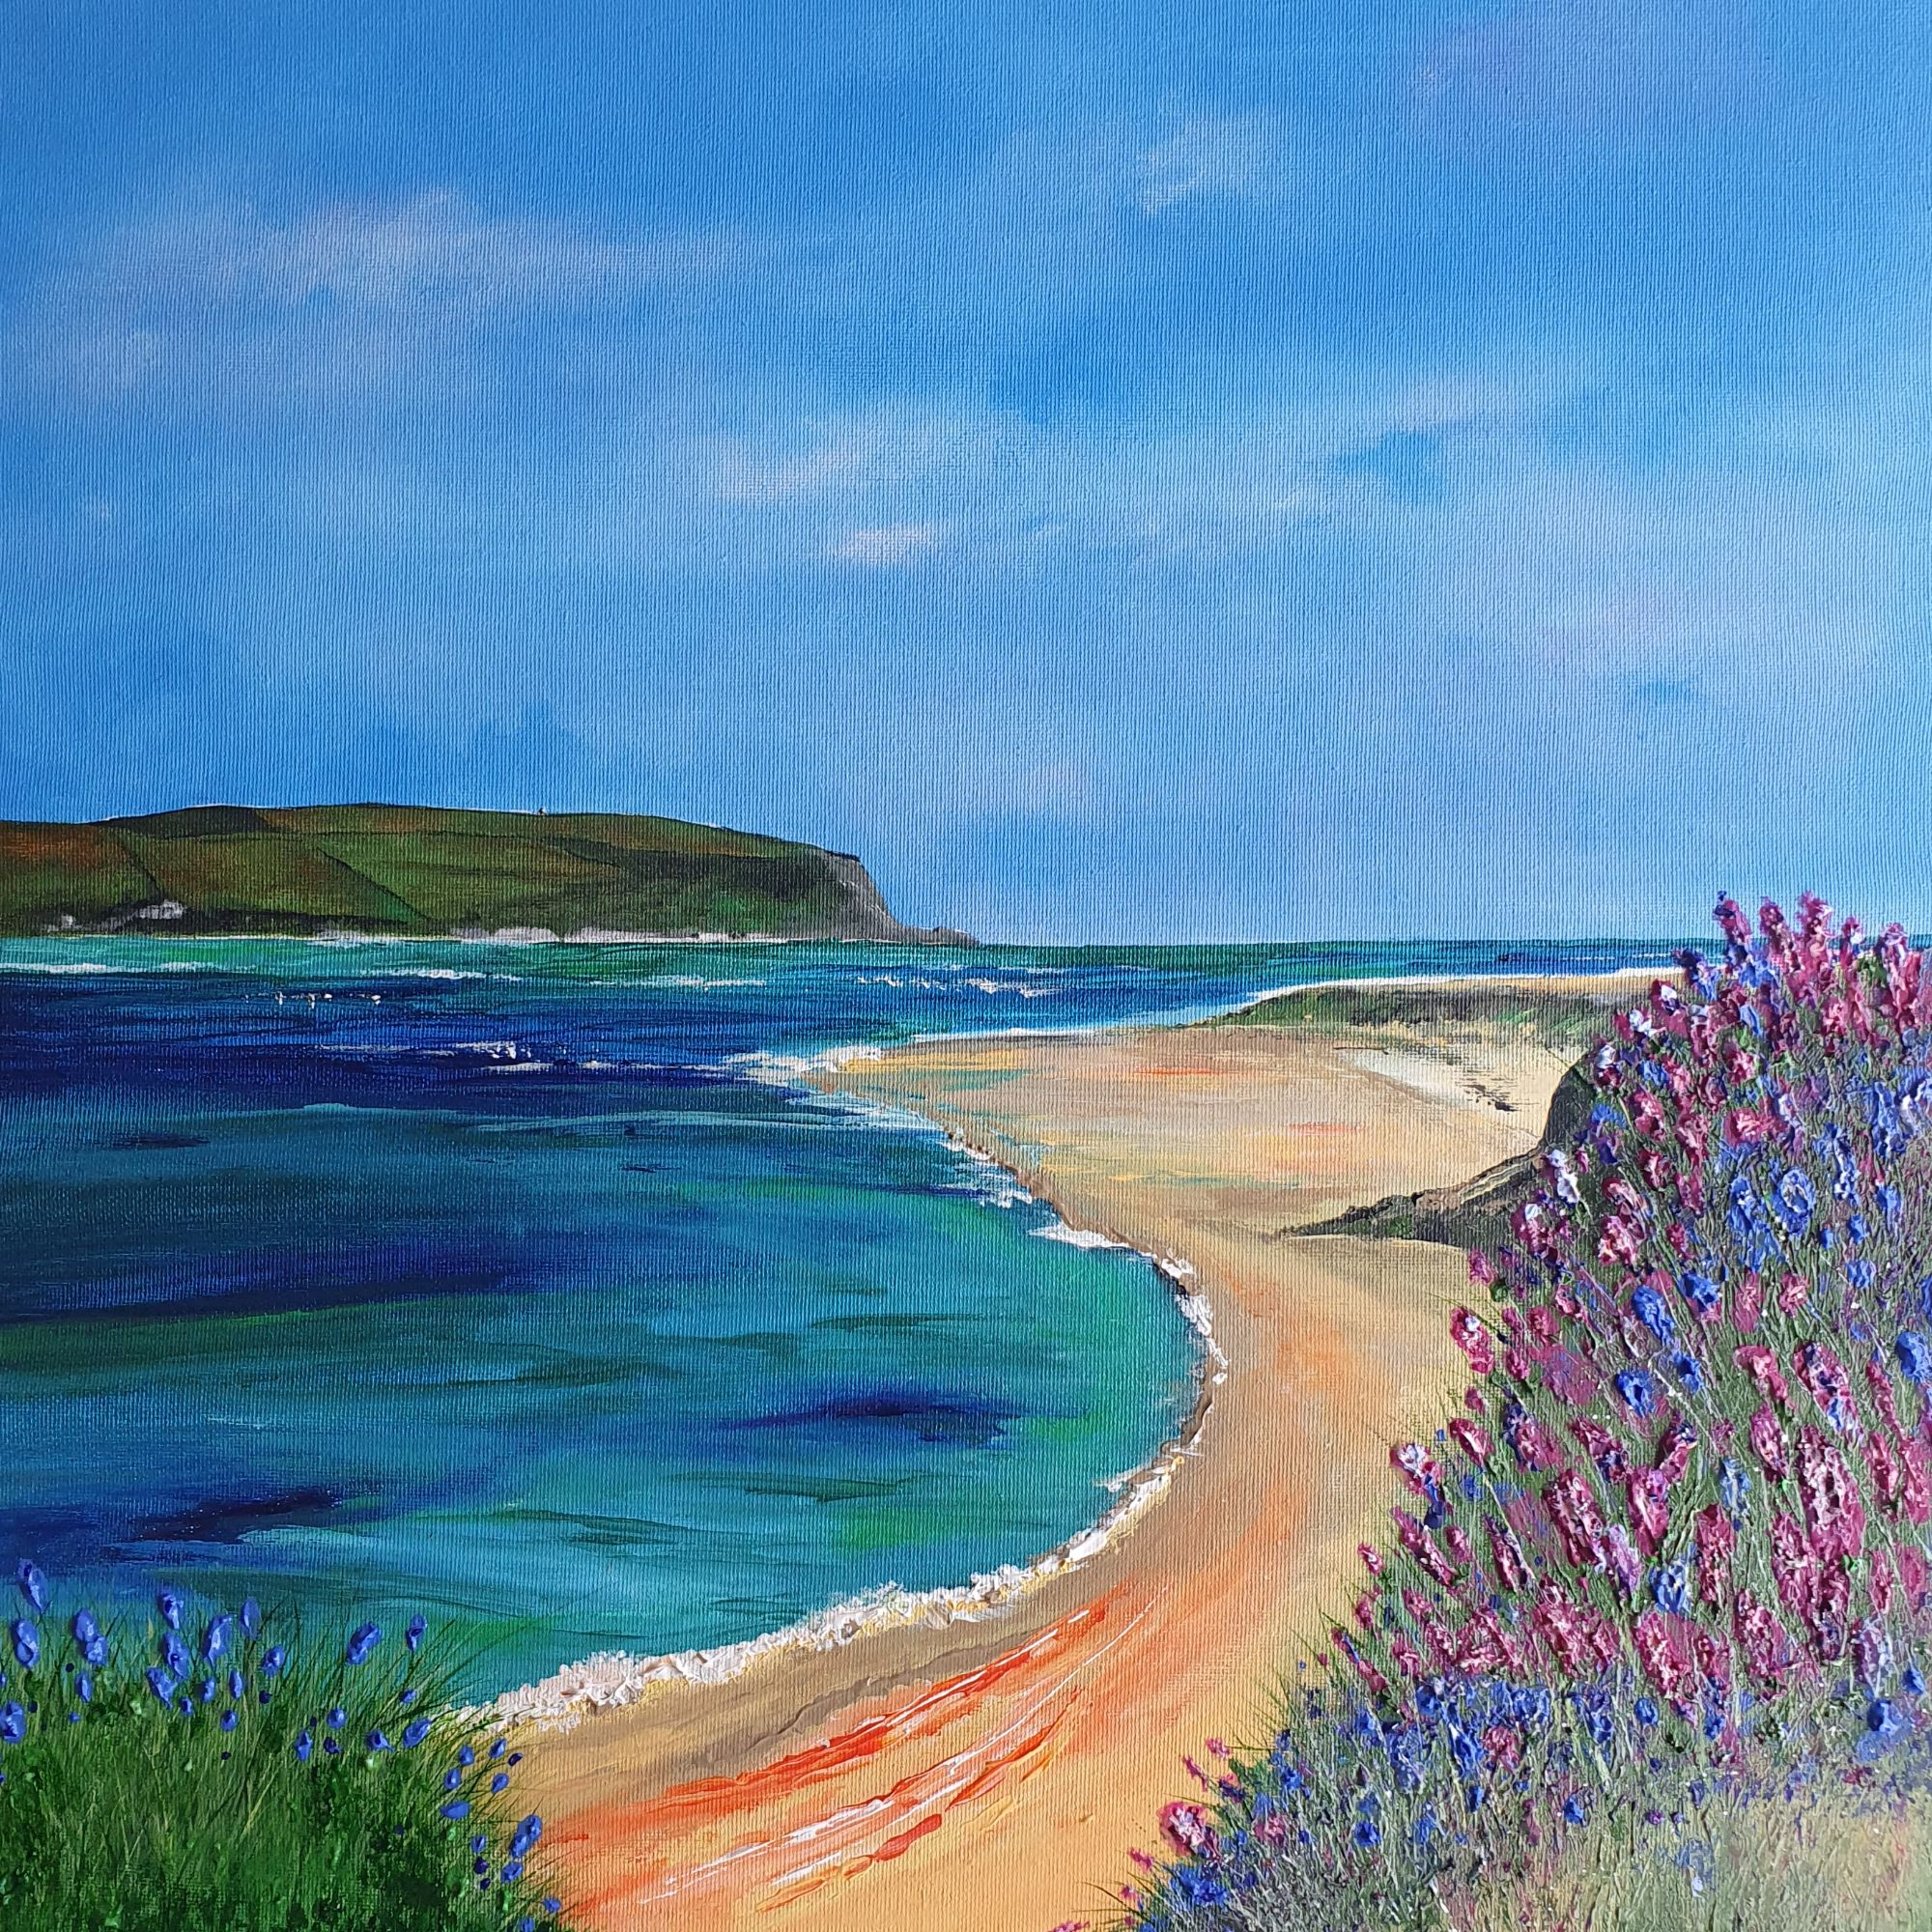 Original Cornish landscape painting by artist Beverley Ismail